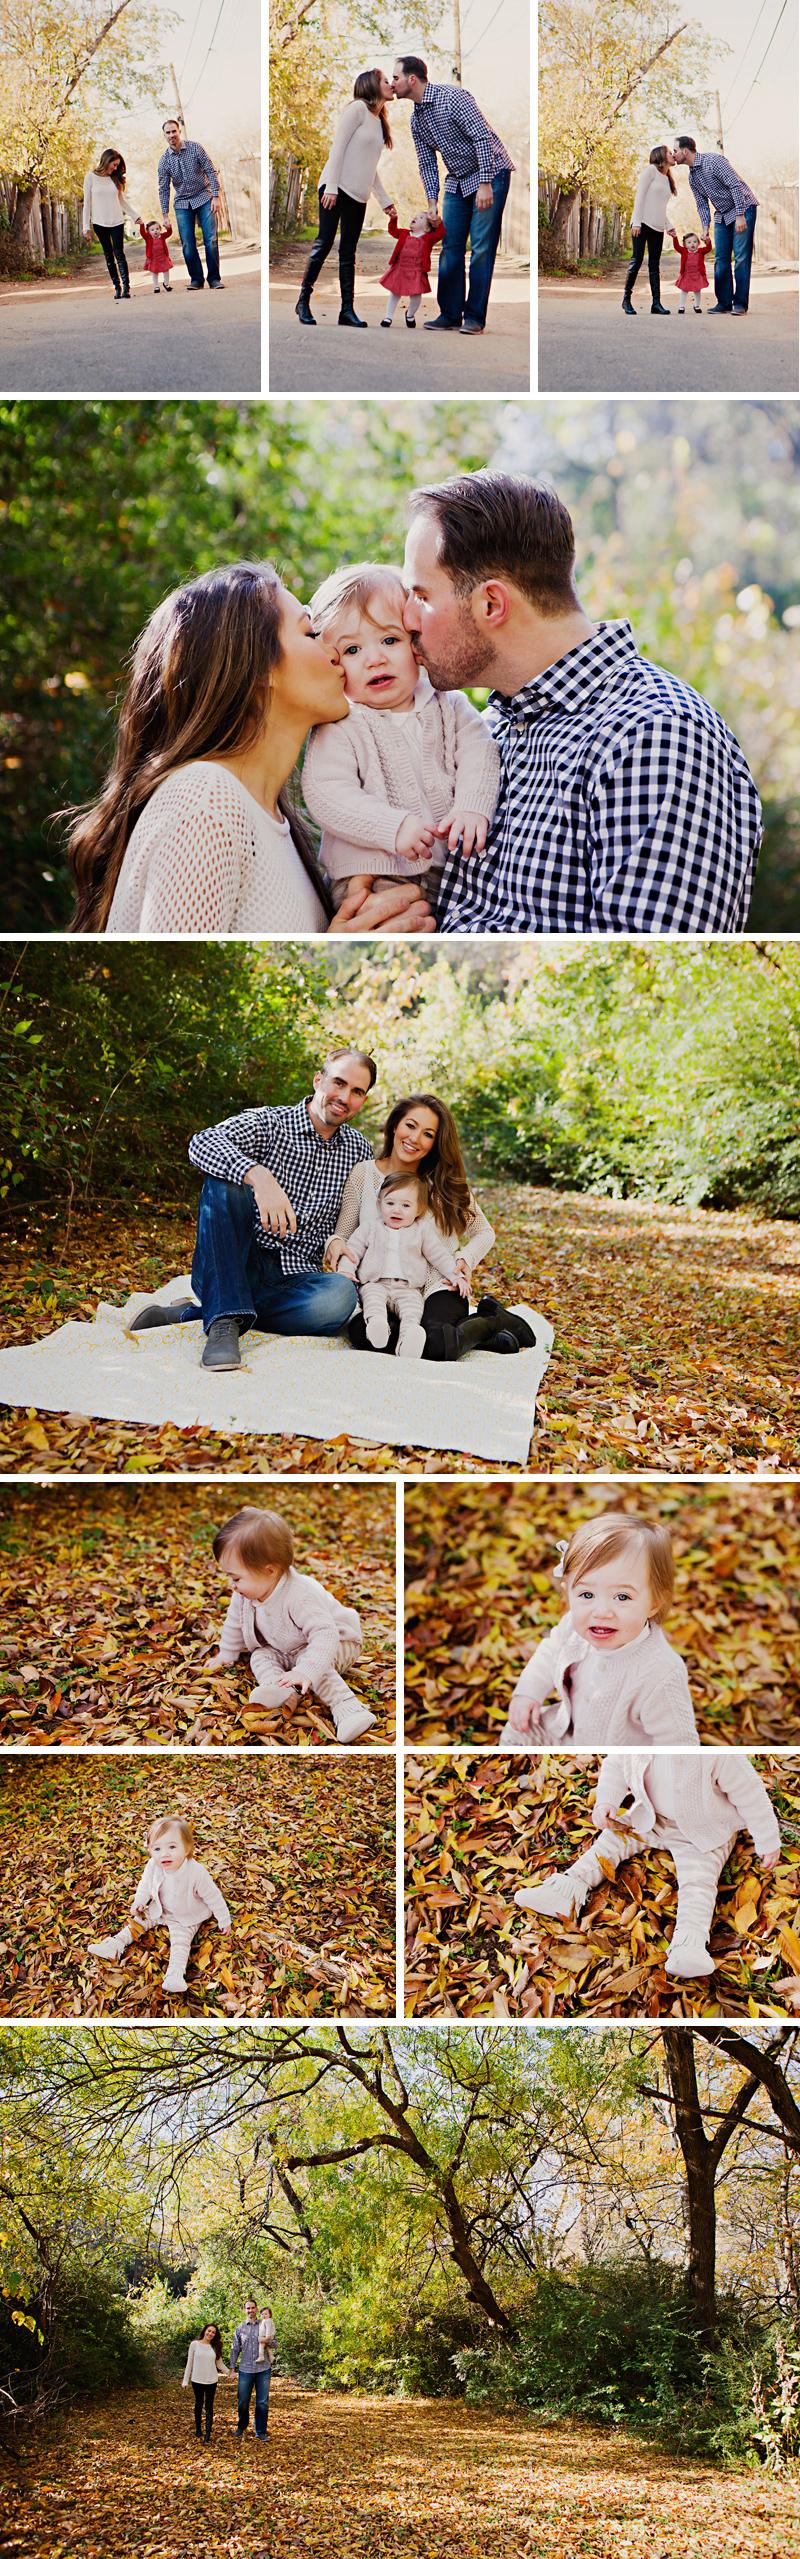 Dallas-Family-Photographerc068